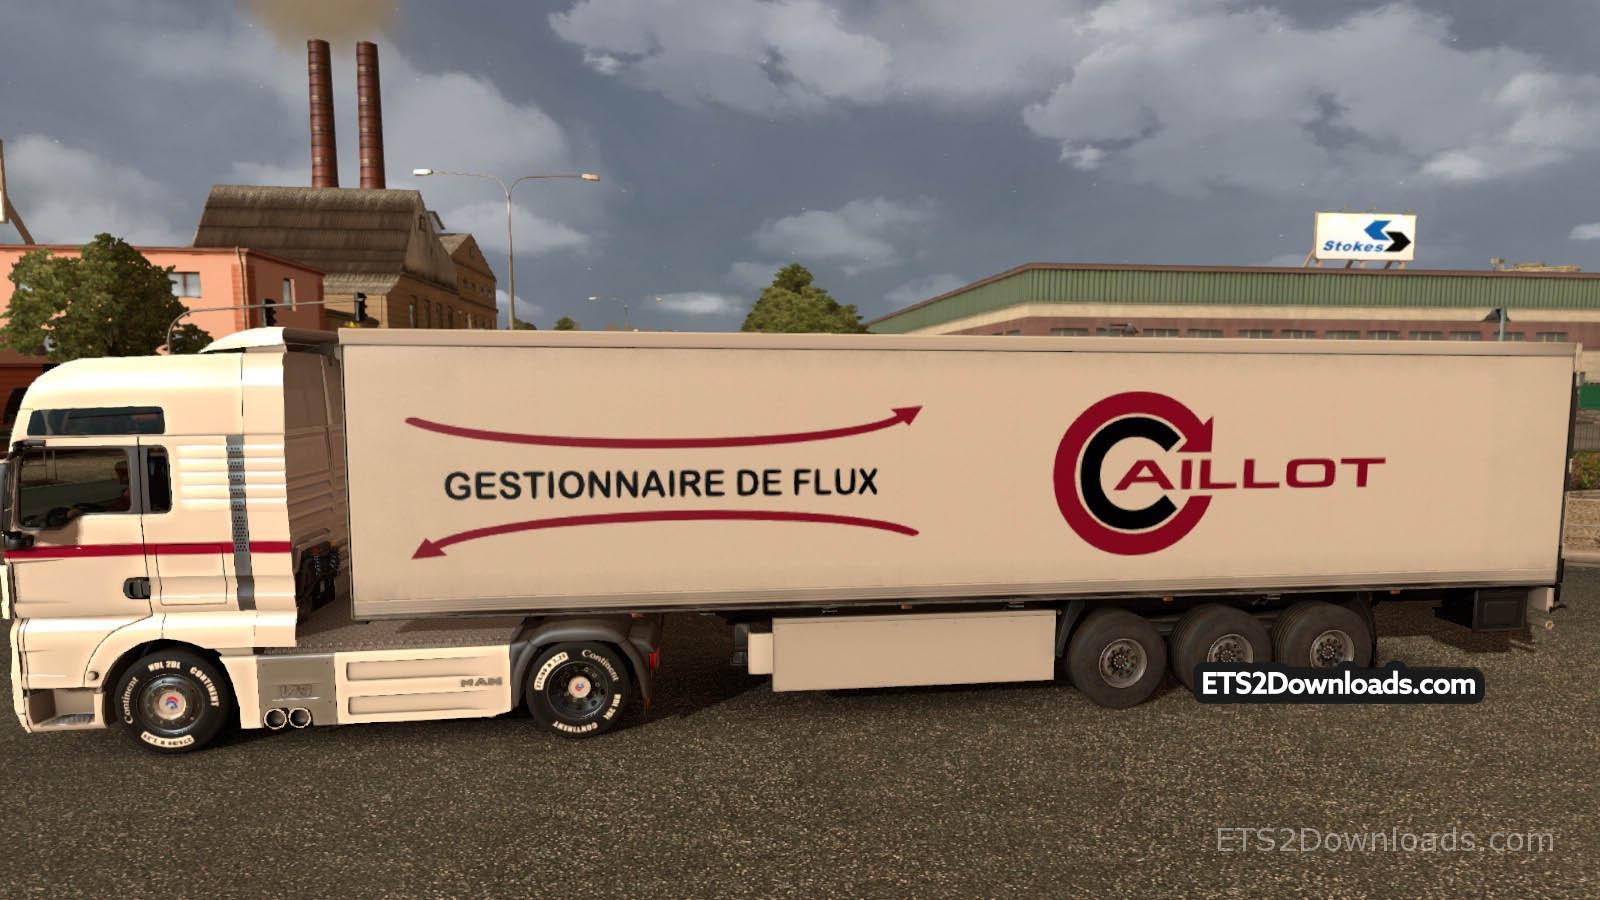 calliot-transport-skin-and-trailer-for-man-1